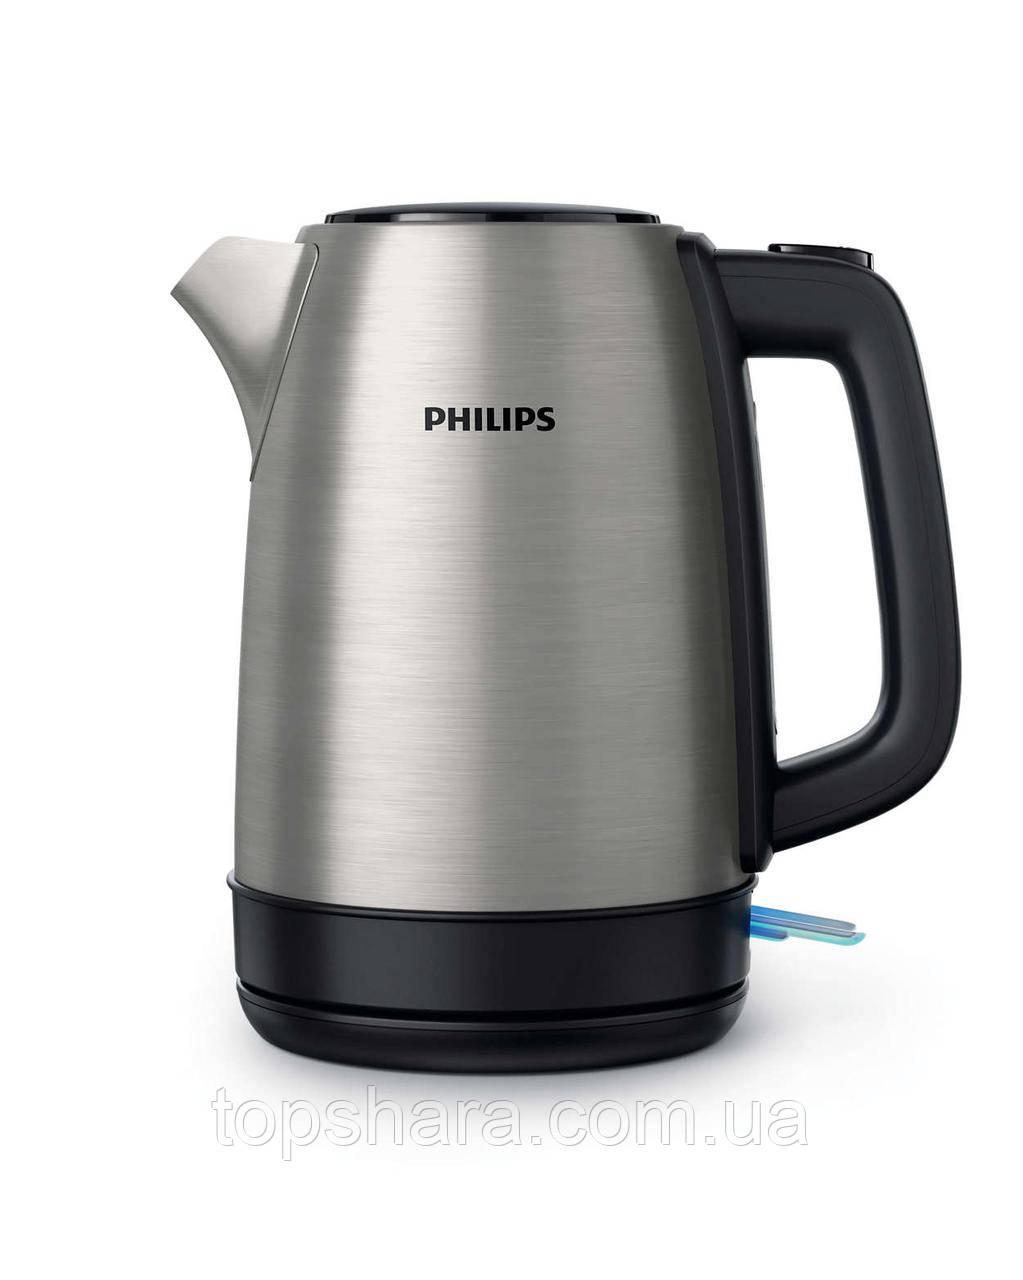 Електрочайник Philips HD9350/91